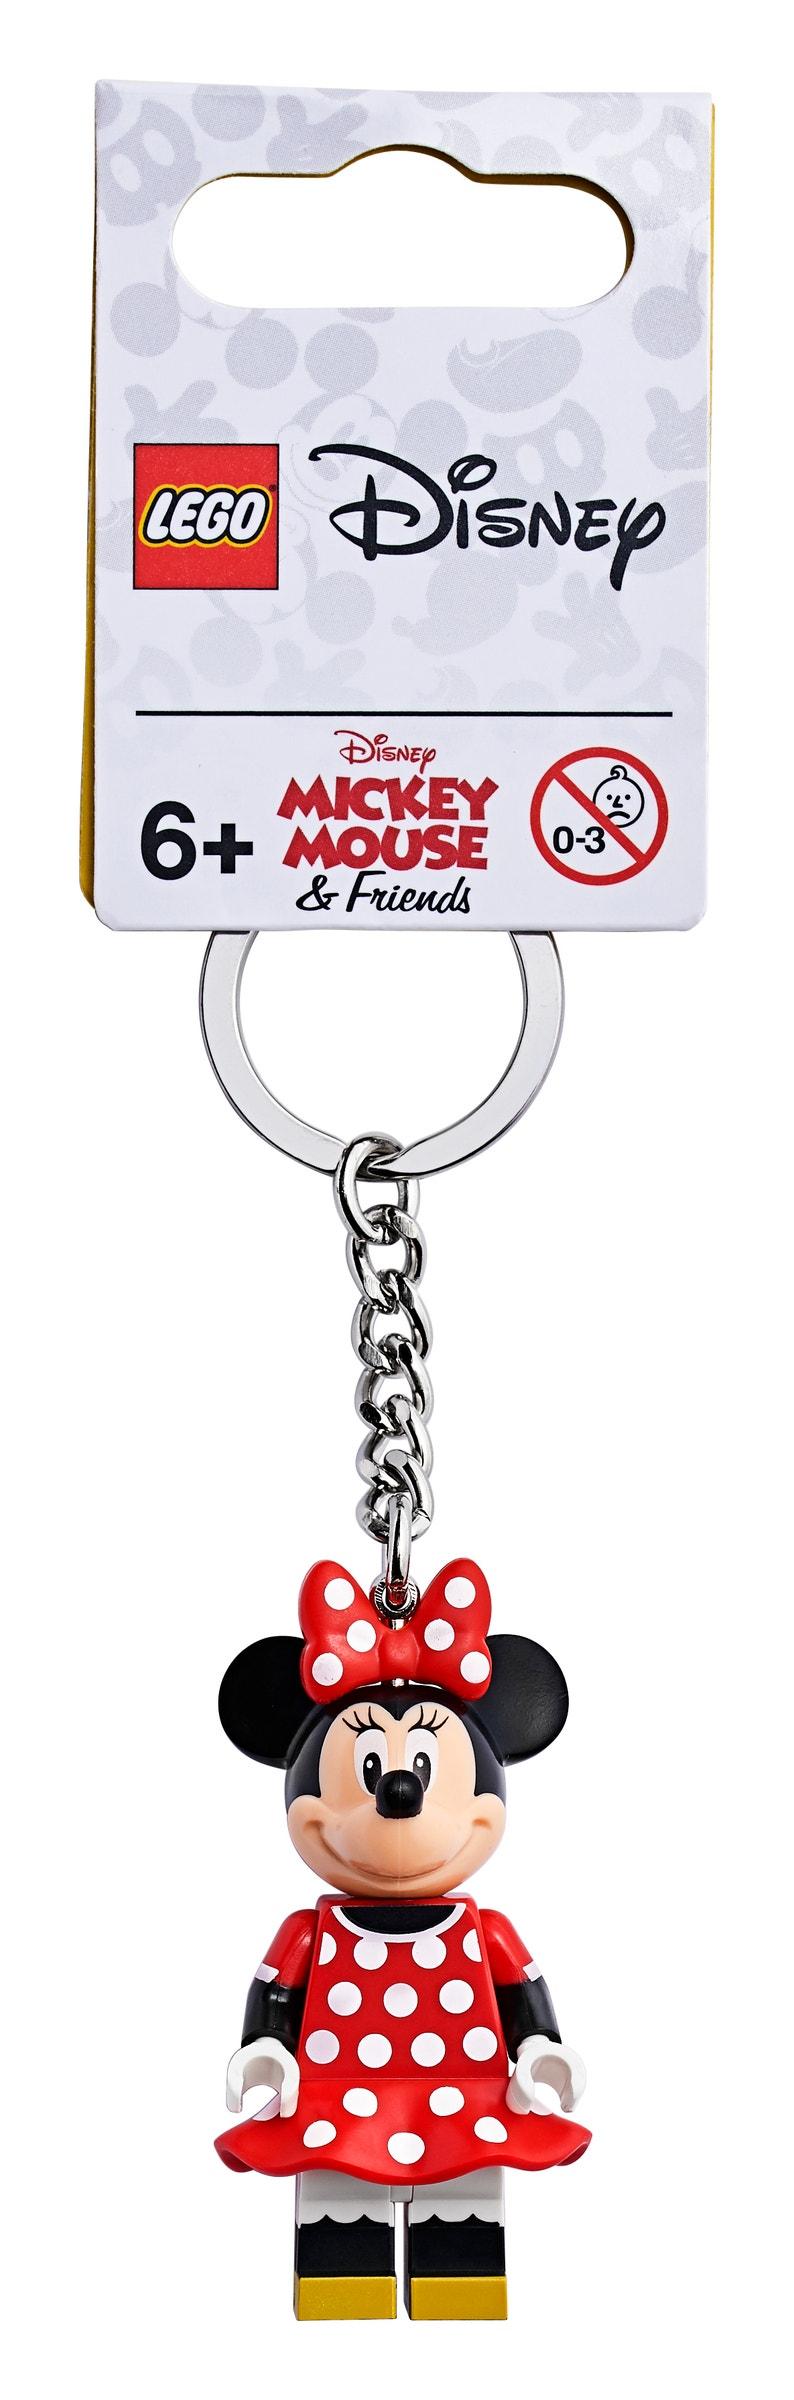 853999 Minnie Mouse Key Chain